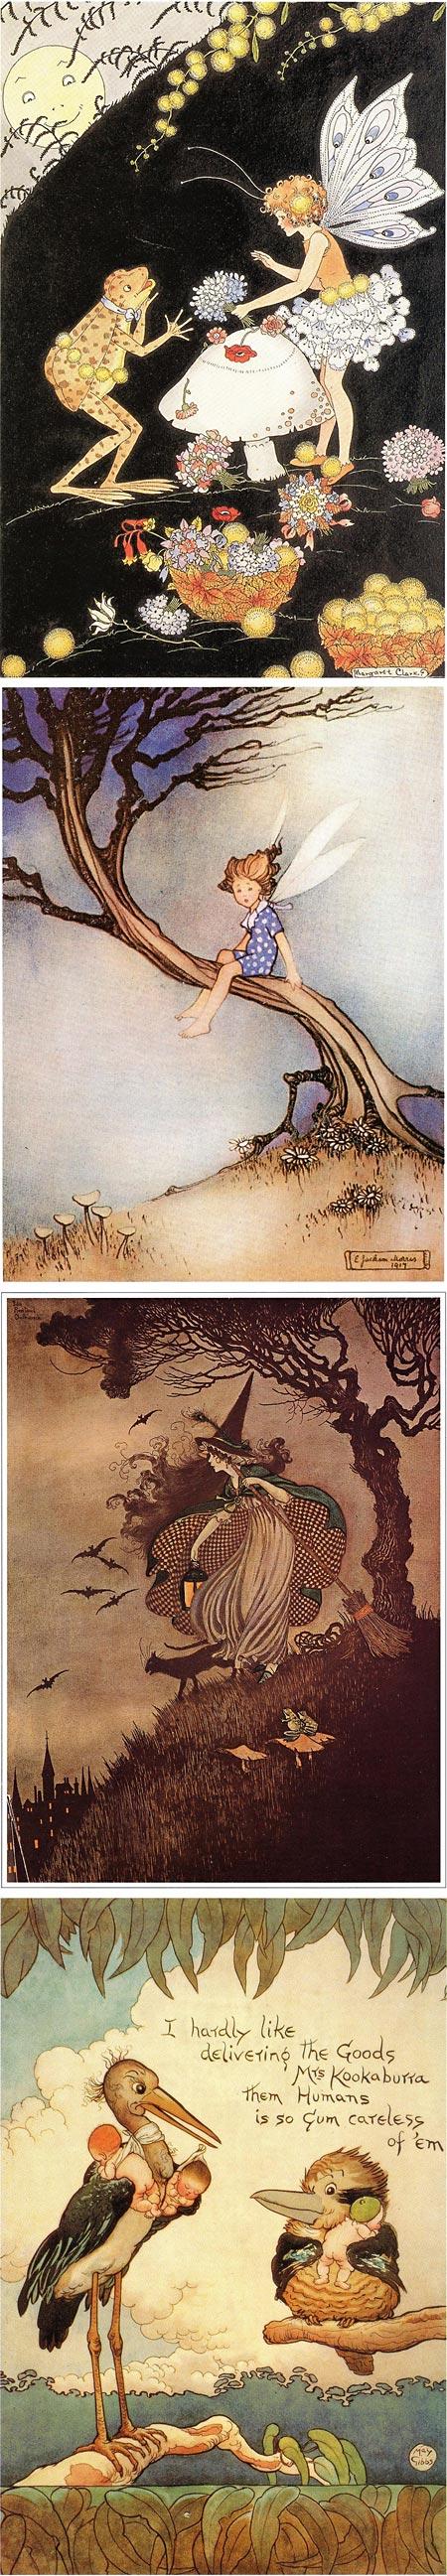 Antipodean Fantasy on BibliOdyssey, Margaret Clark,  Ethel Jackson Morris, Ida Rentoul Outhwaite, May Gibbs